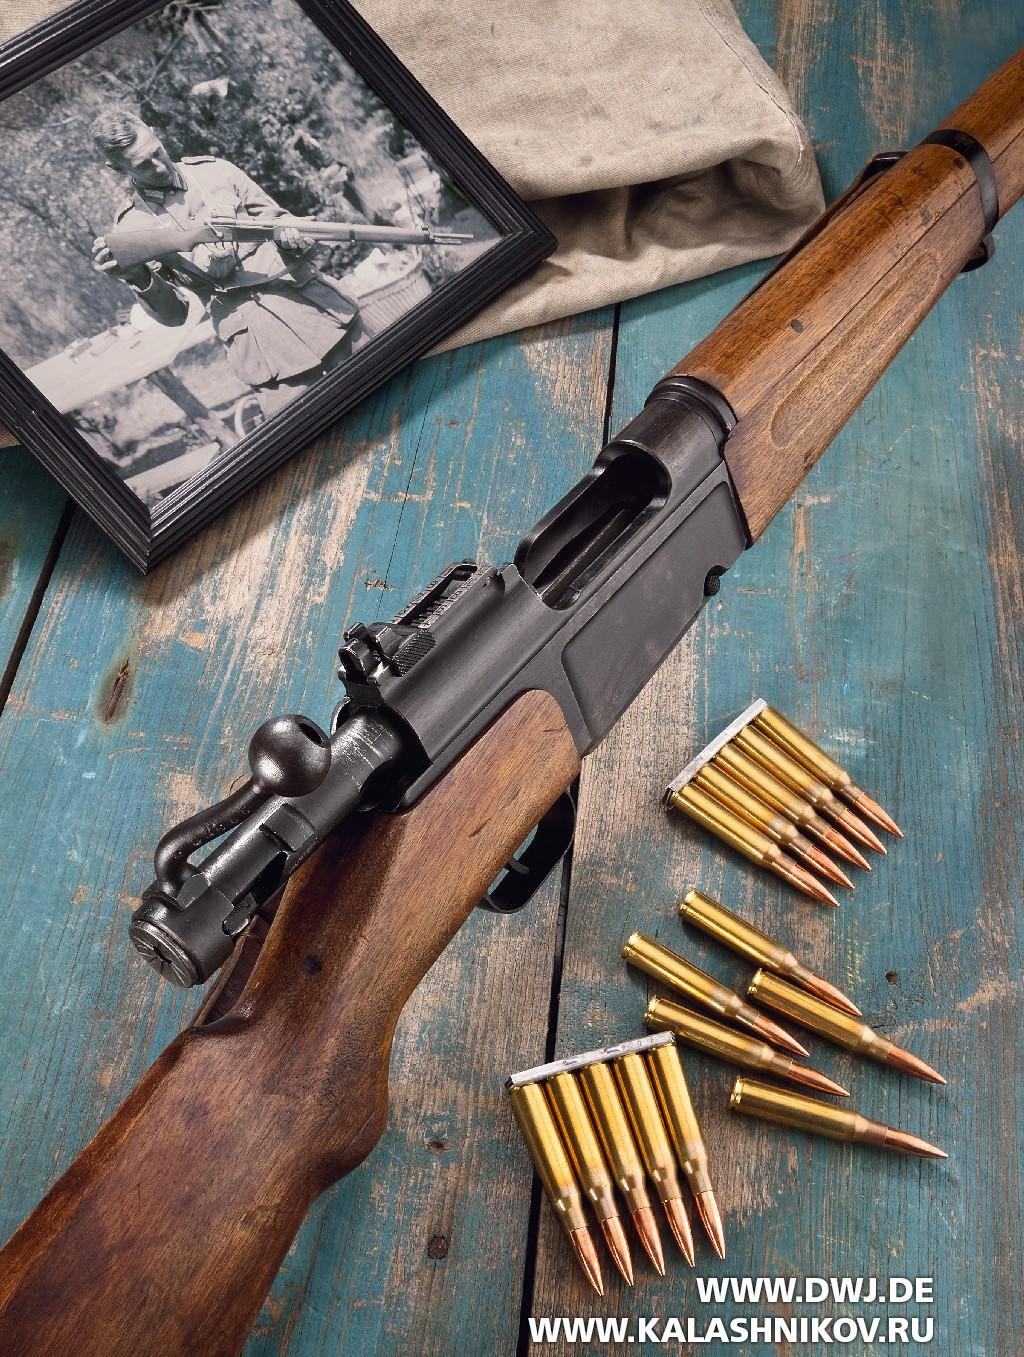 Французская пехотная винтовка MAS Modell36. Фото 1